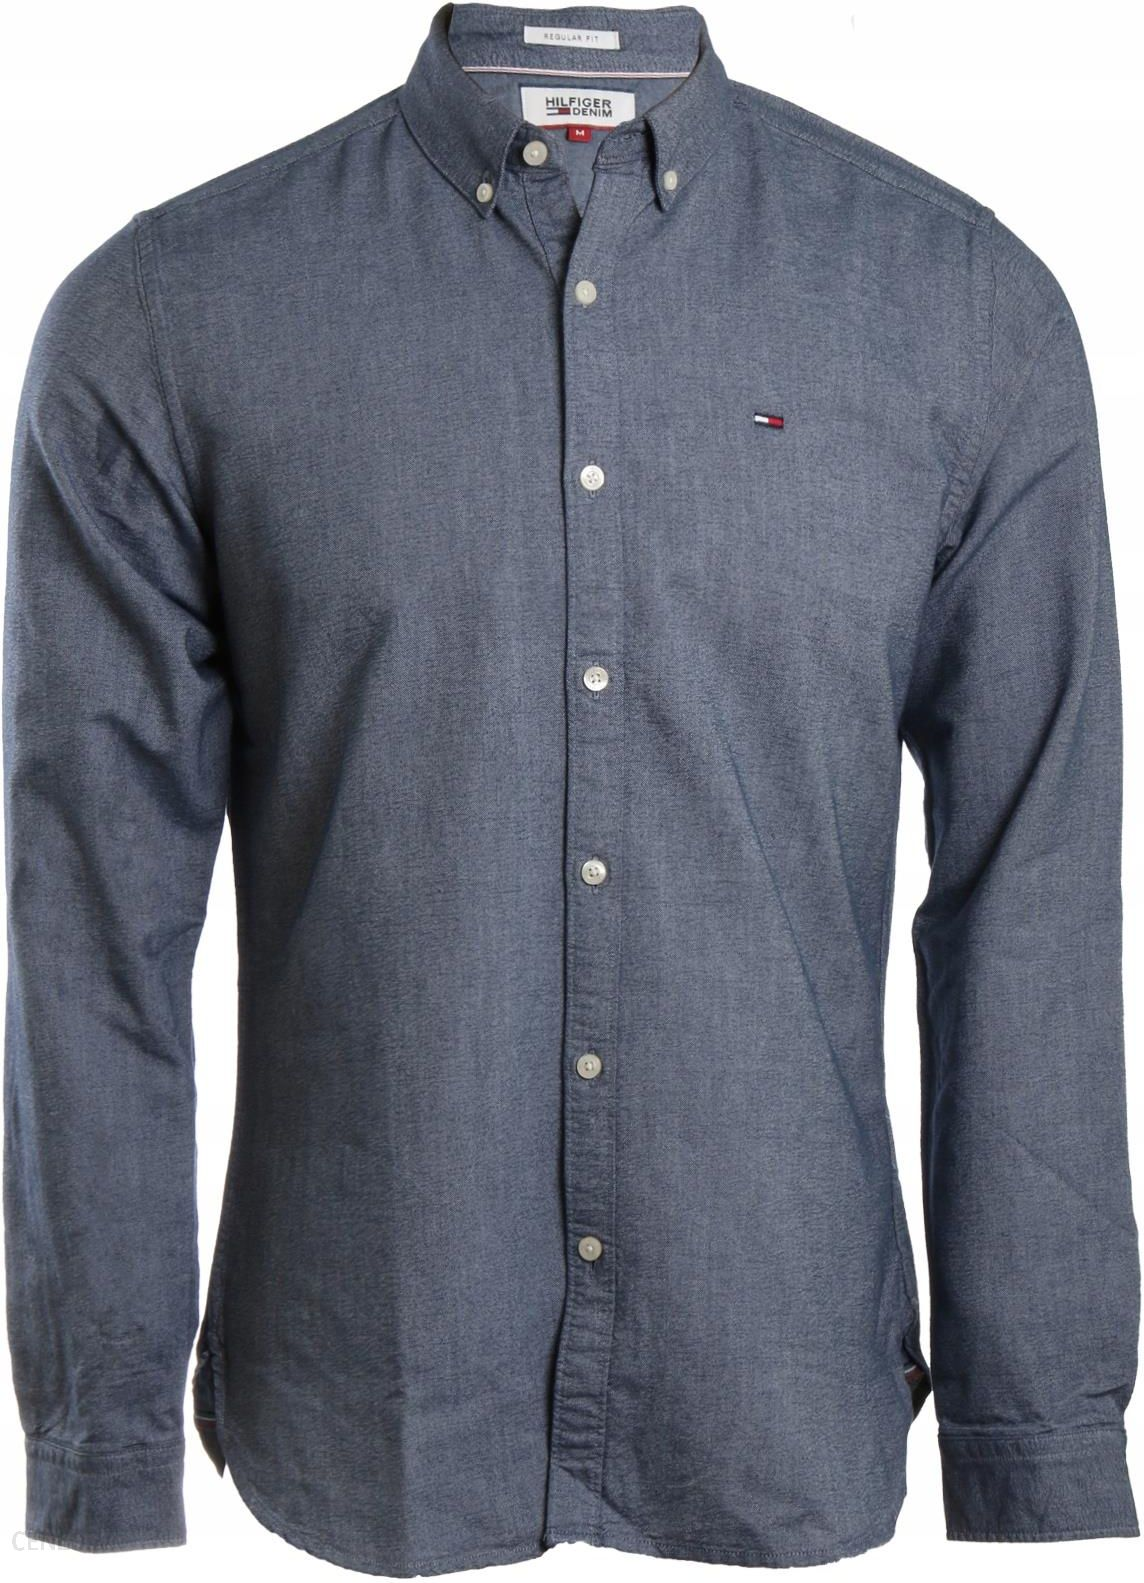 5fd7f5172e05b Tommy Hilfiger koszula casual DM0DM01590-002 M - Ceny i opinie ...